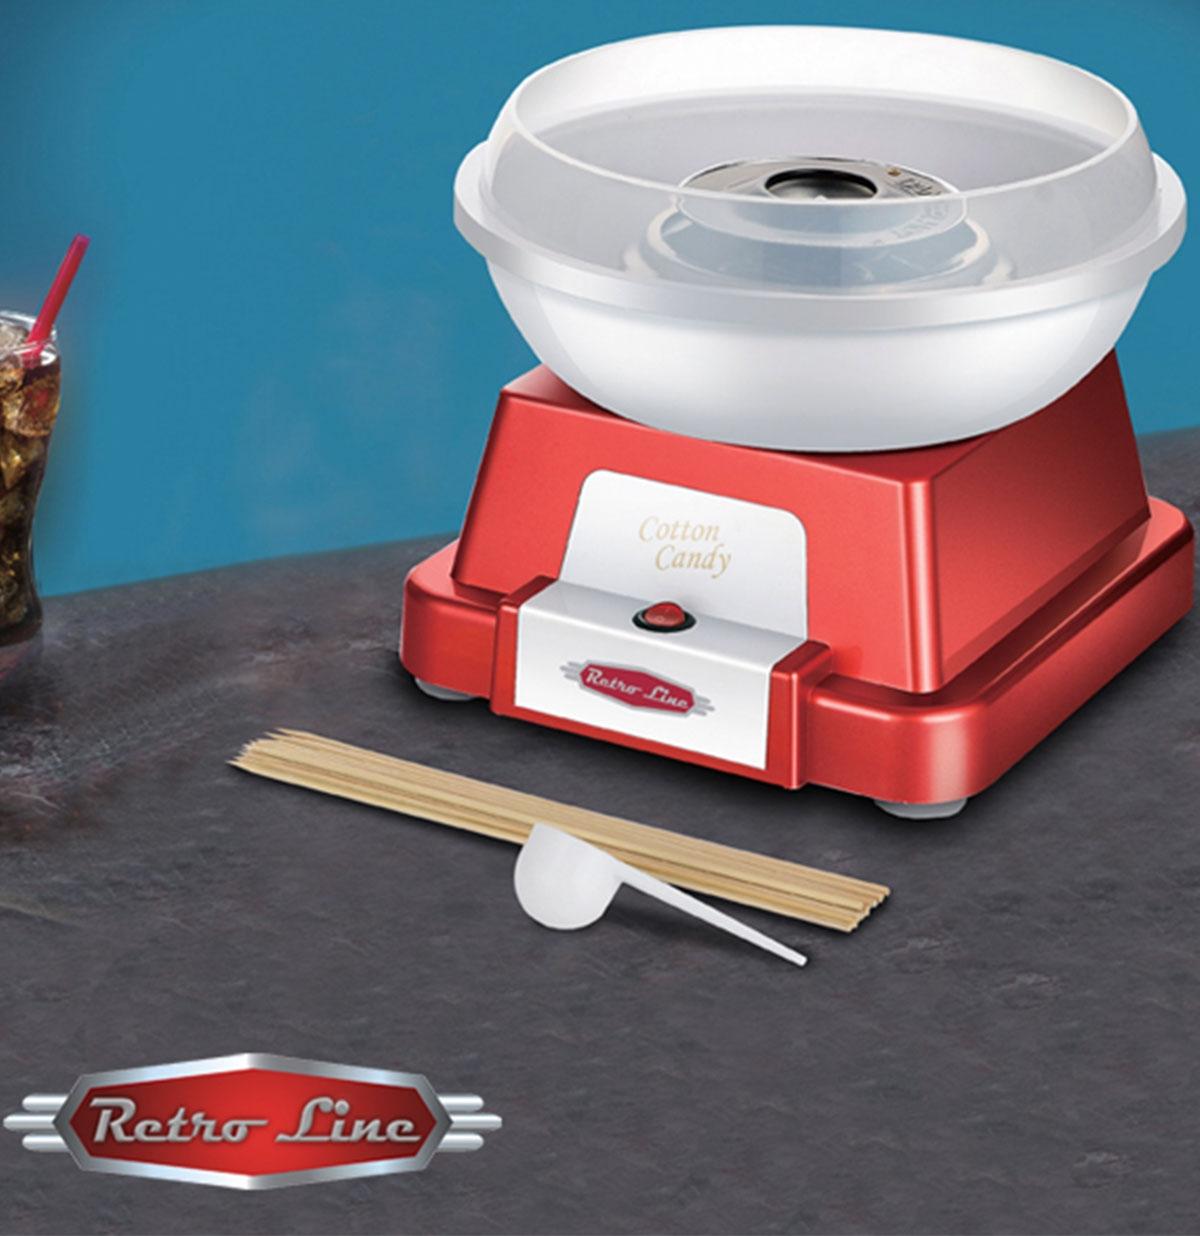 Retro Stijl Suikerspin Maker - Red